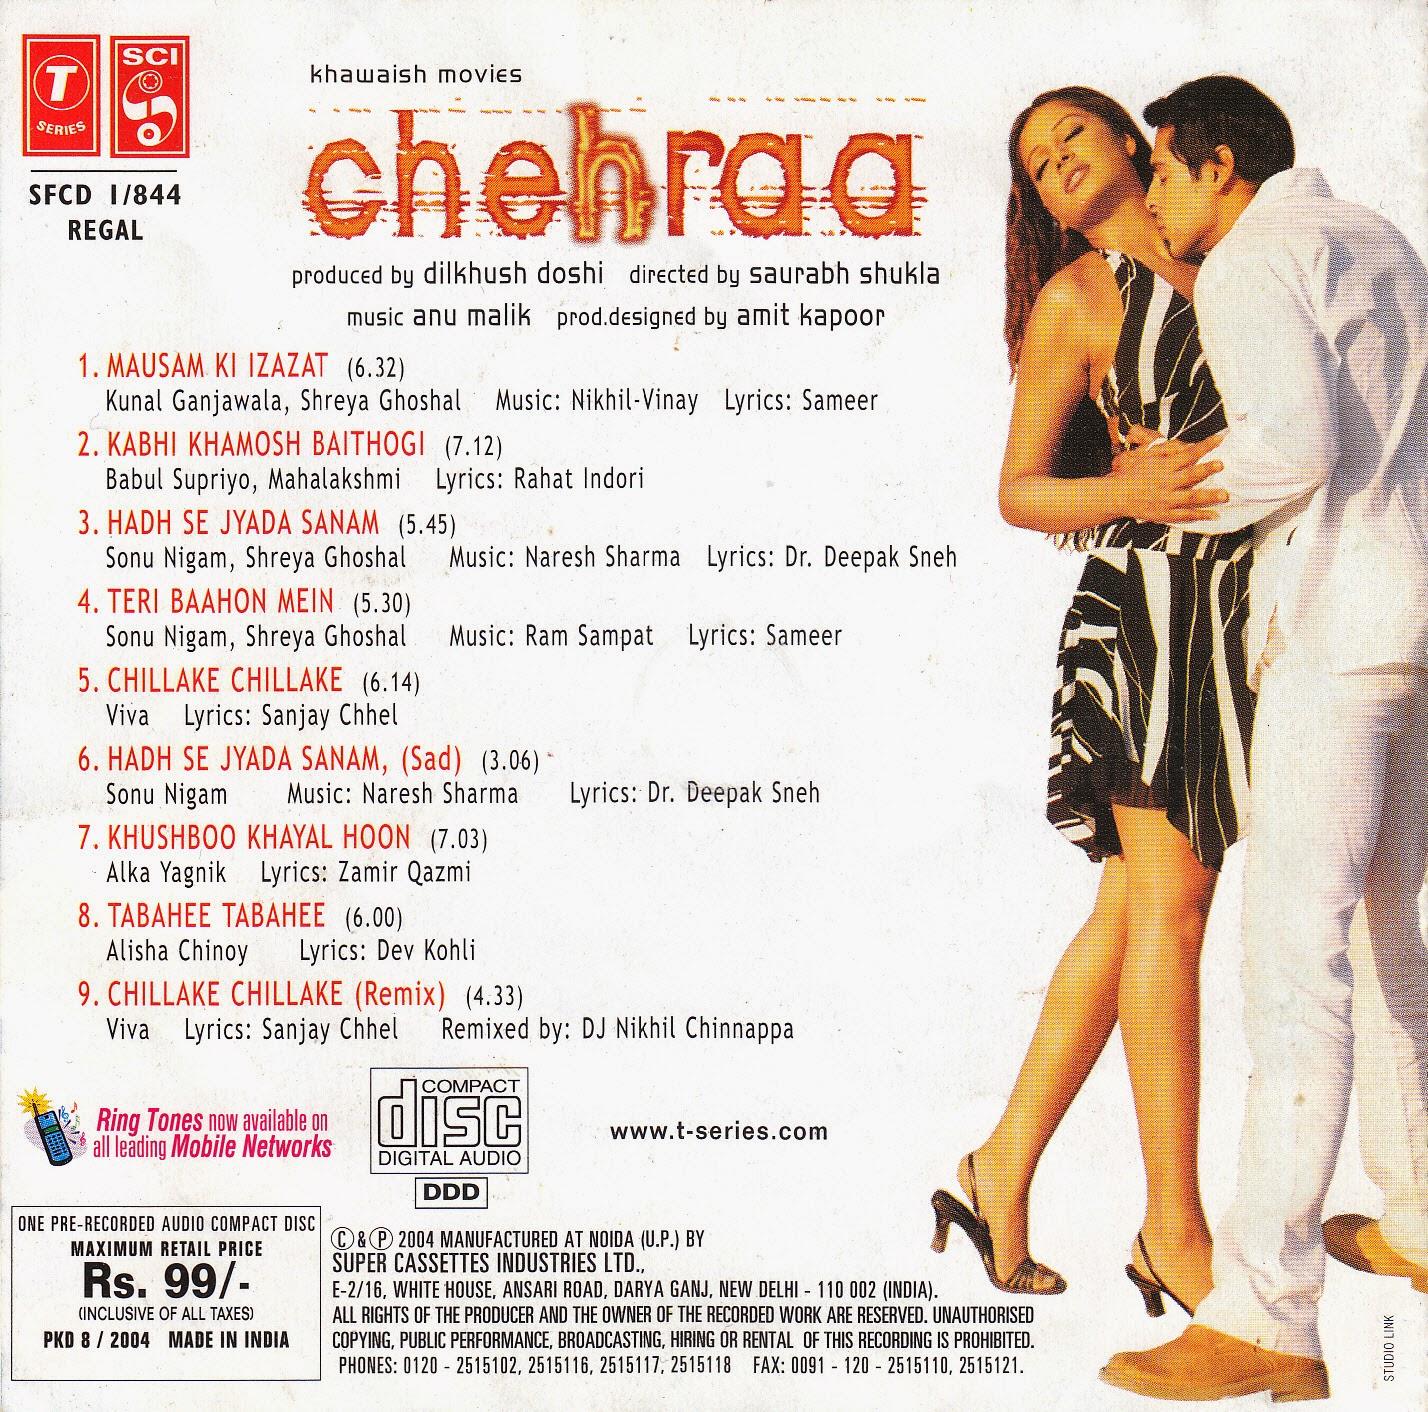 Im A Rider Song Download 320kbps: THE HOME OF SHREYA GHOSHAL SONGS: Chehraa [2004-MP3-VBR